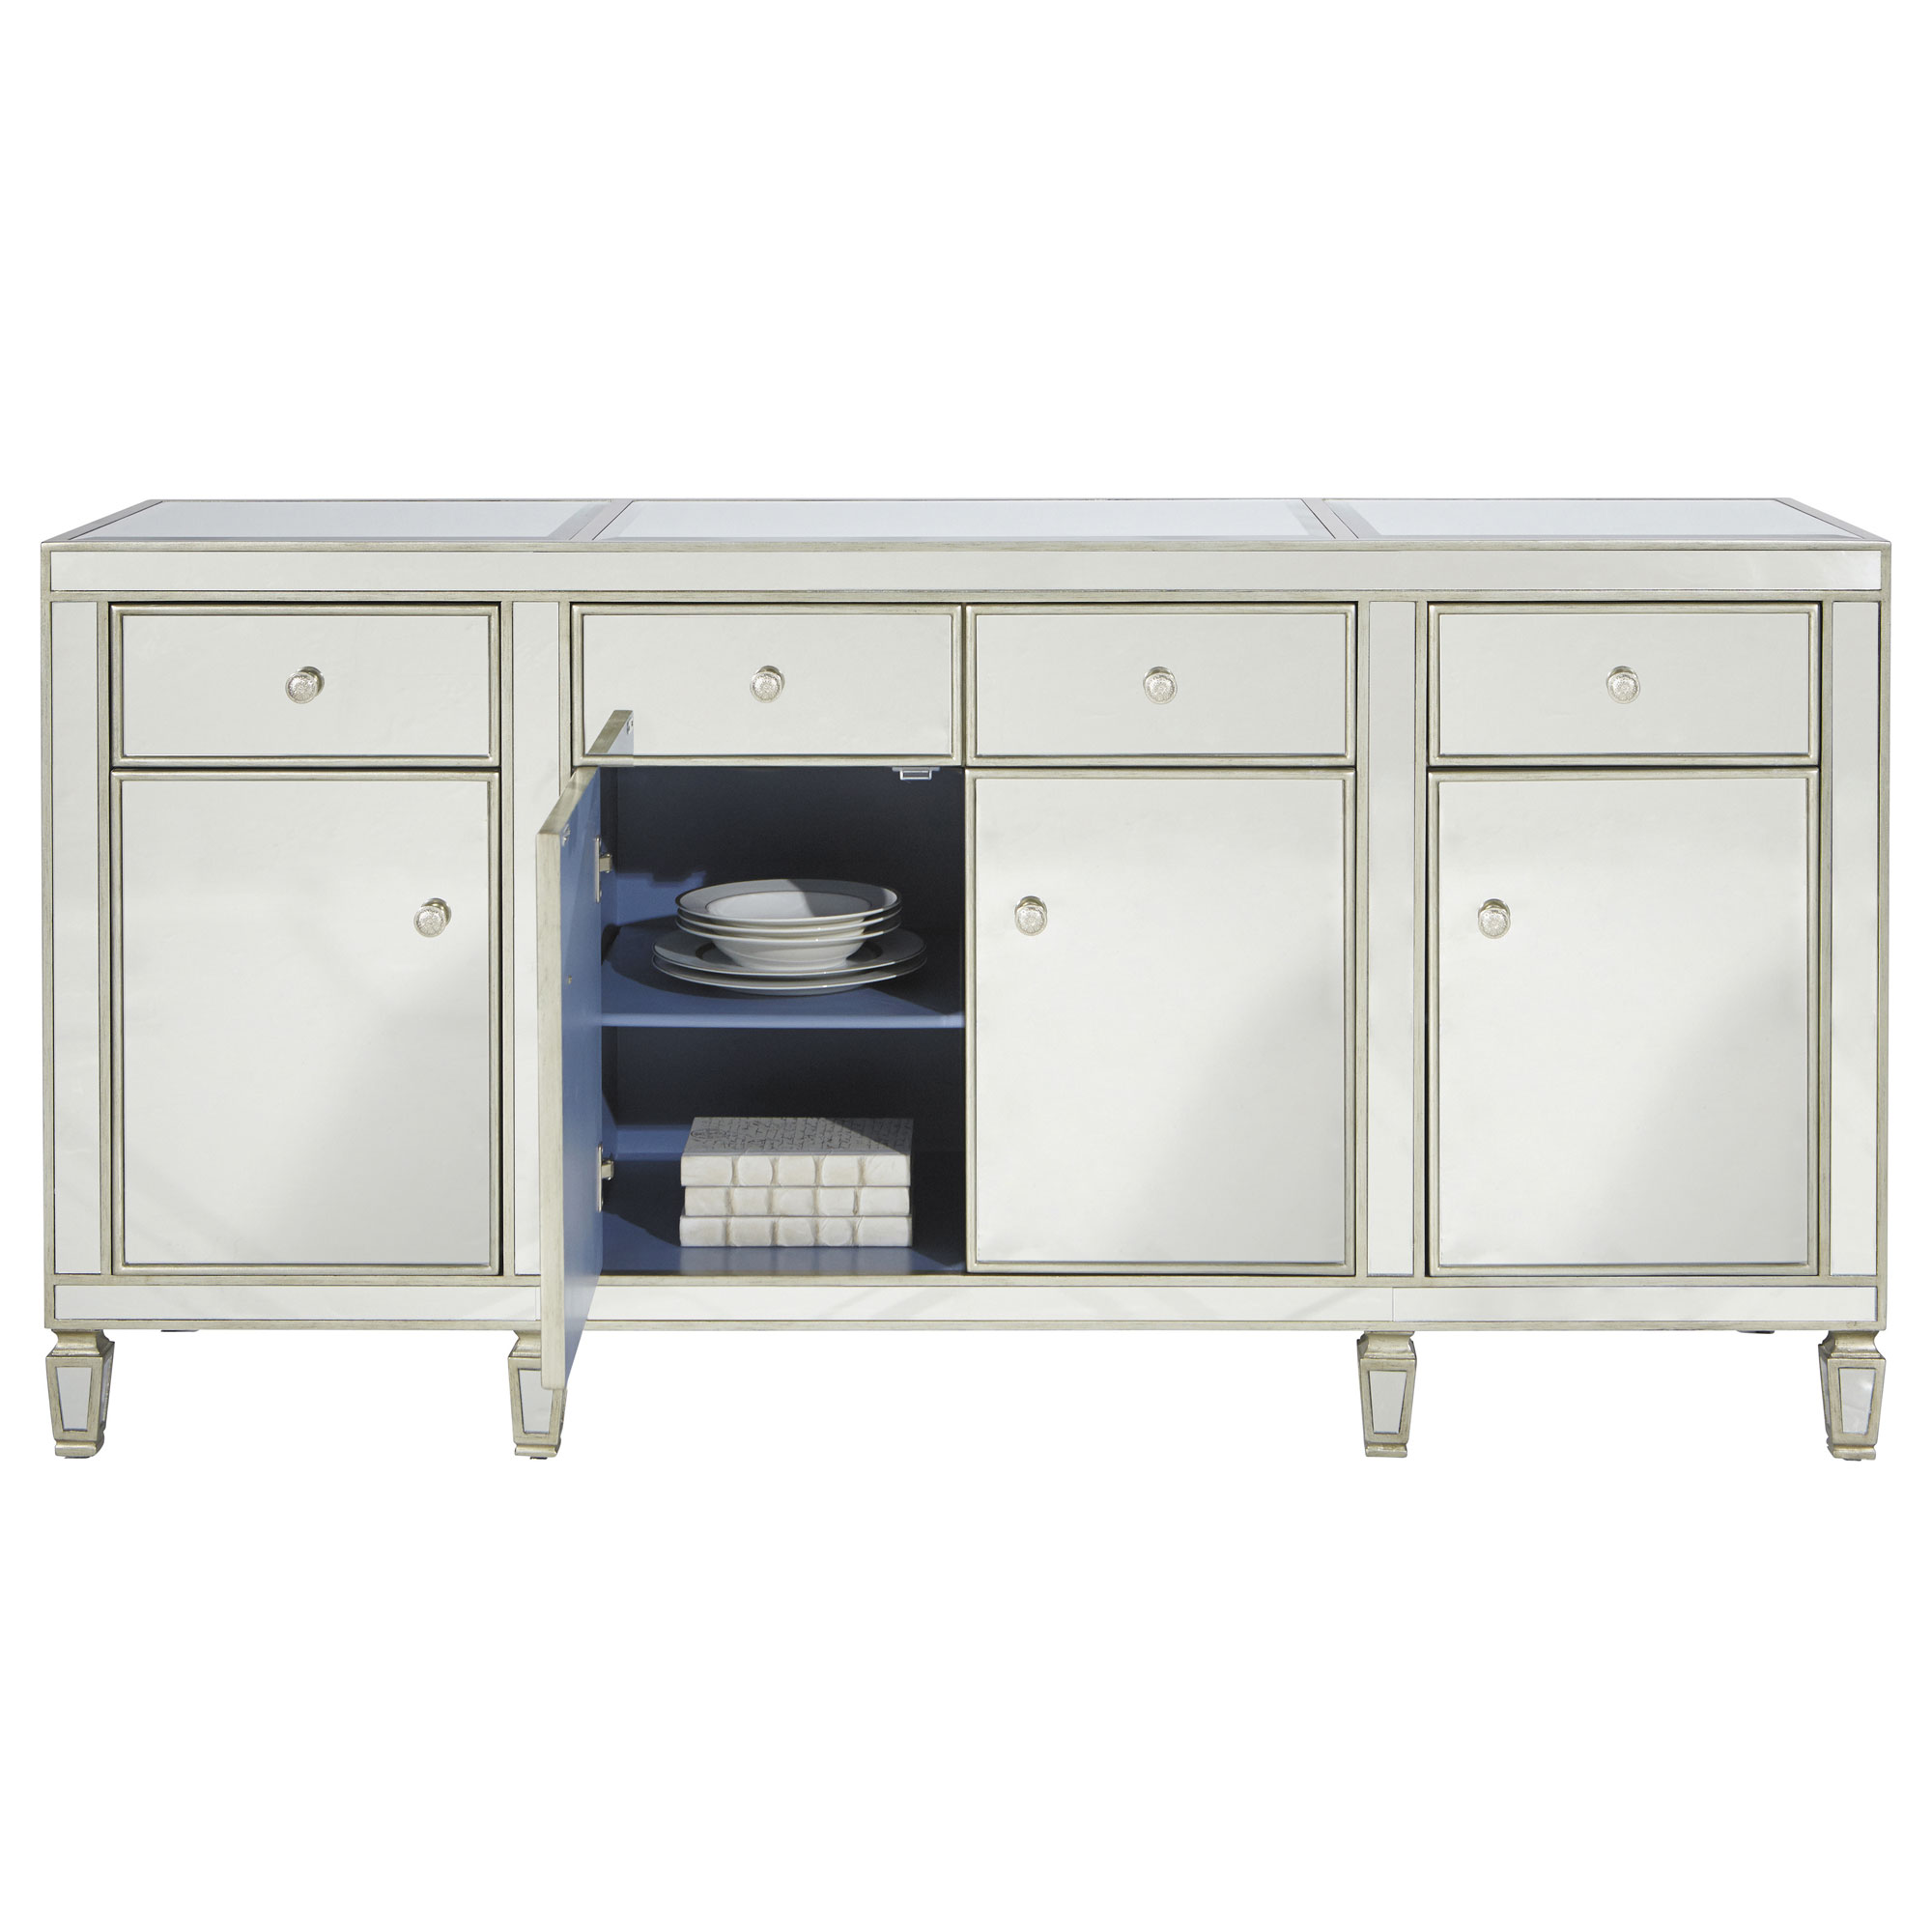 Mirrored Credenza | Pulaski | Home Gallery Stores